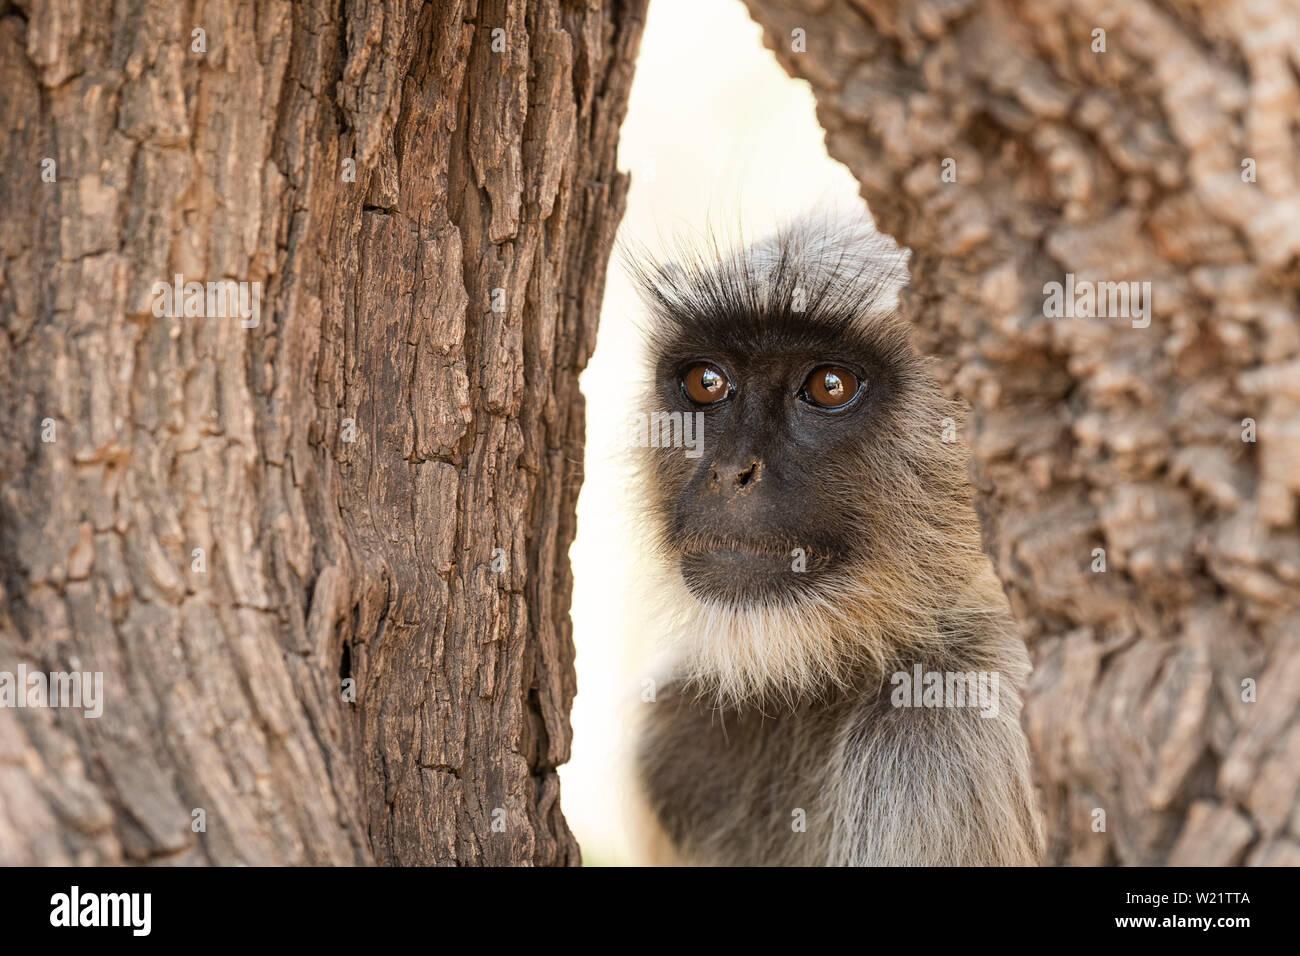 Gray langurs, sacred langurs, Indian langurs or Hanuman langurs, Old World monkeys portrait native to the Indian subcontinent - Stock Image